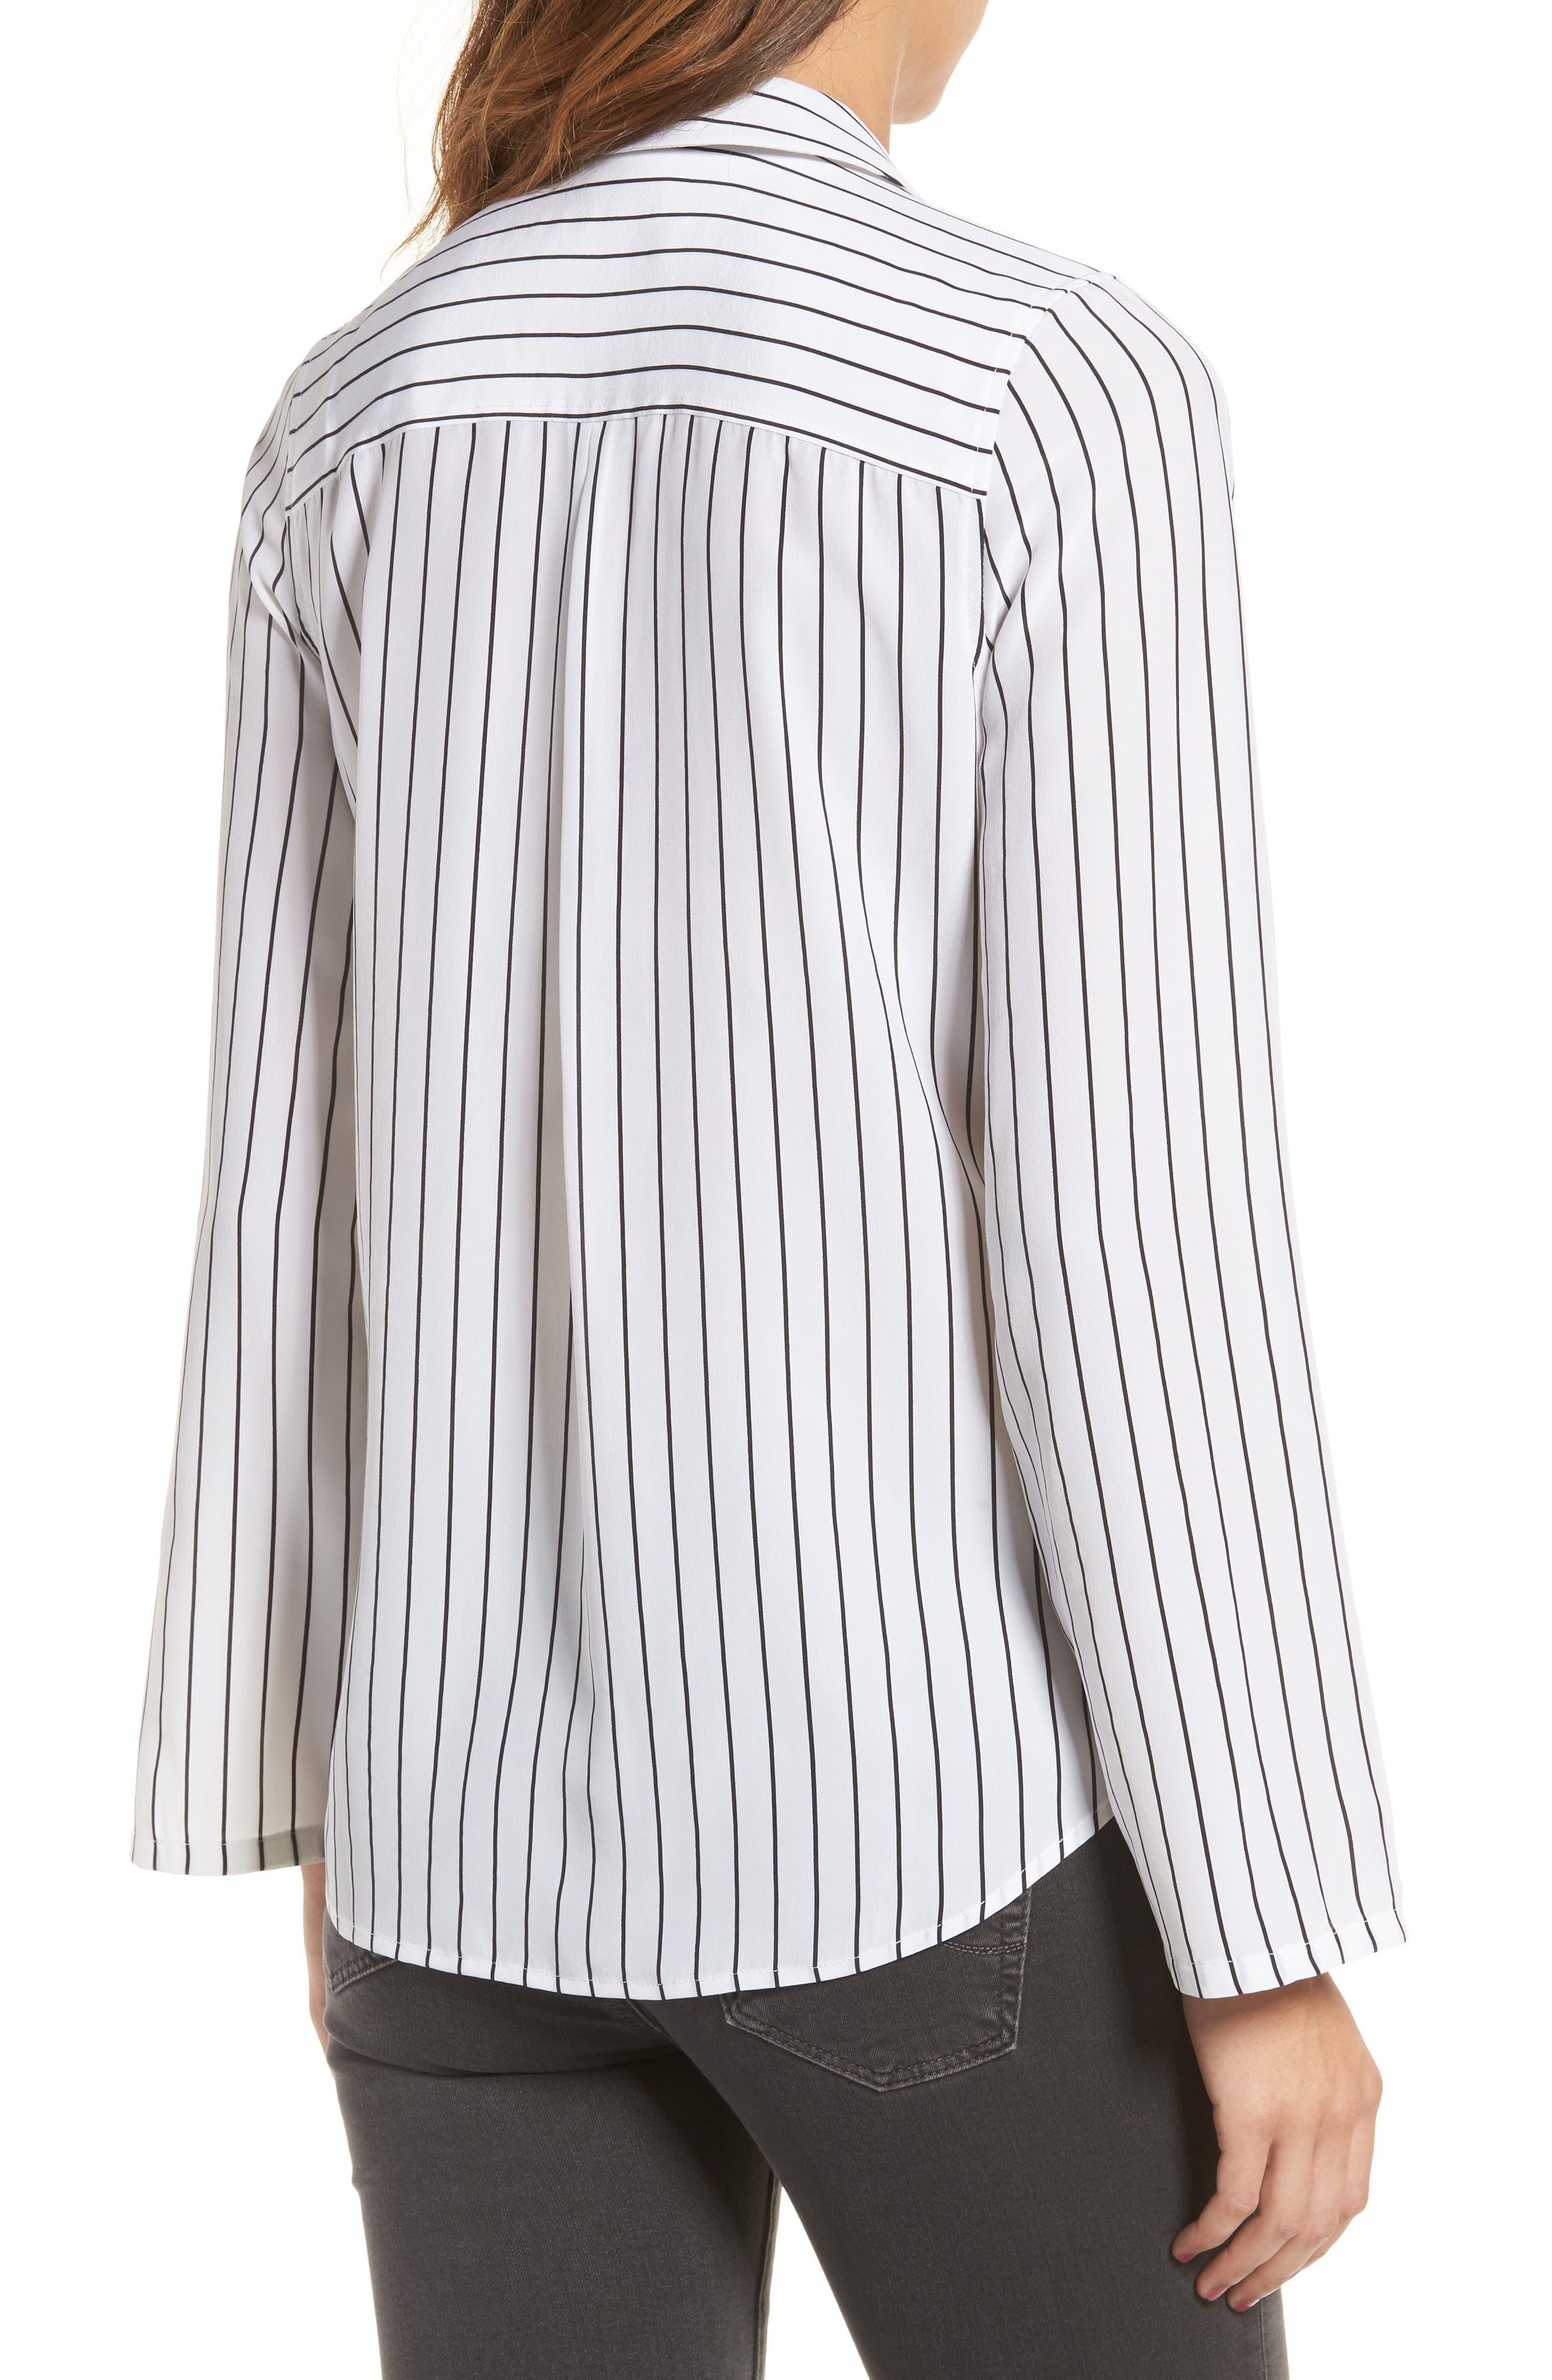 Avery Silk Shirt,                             Alternate thumbnail 2, color,                             True White / True Black Stripe